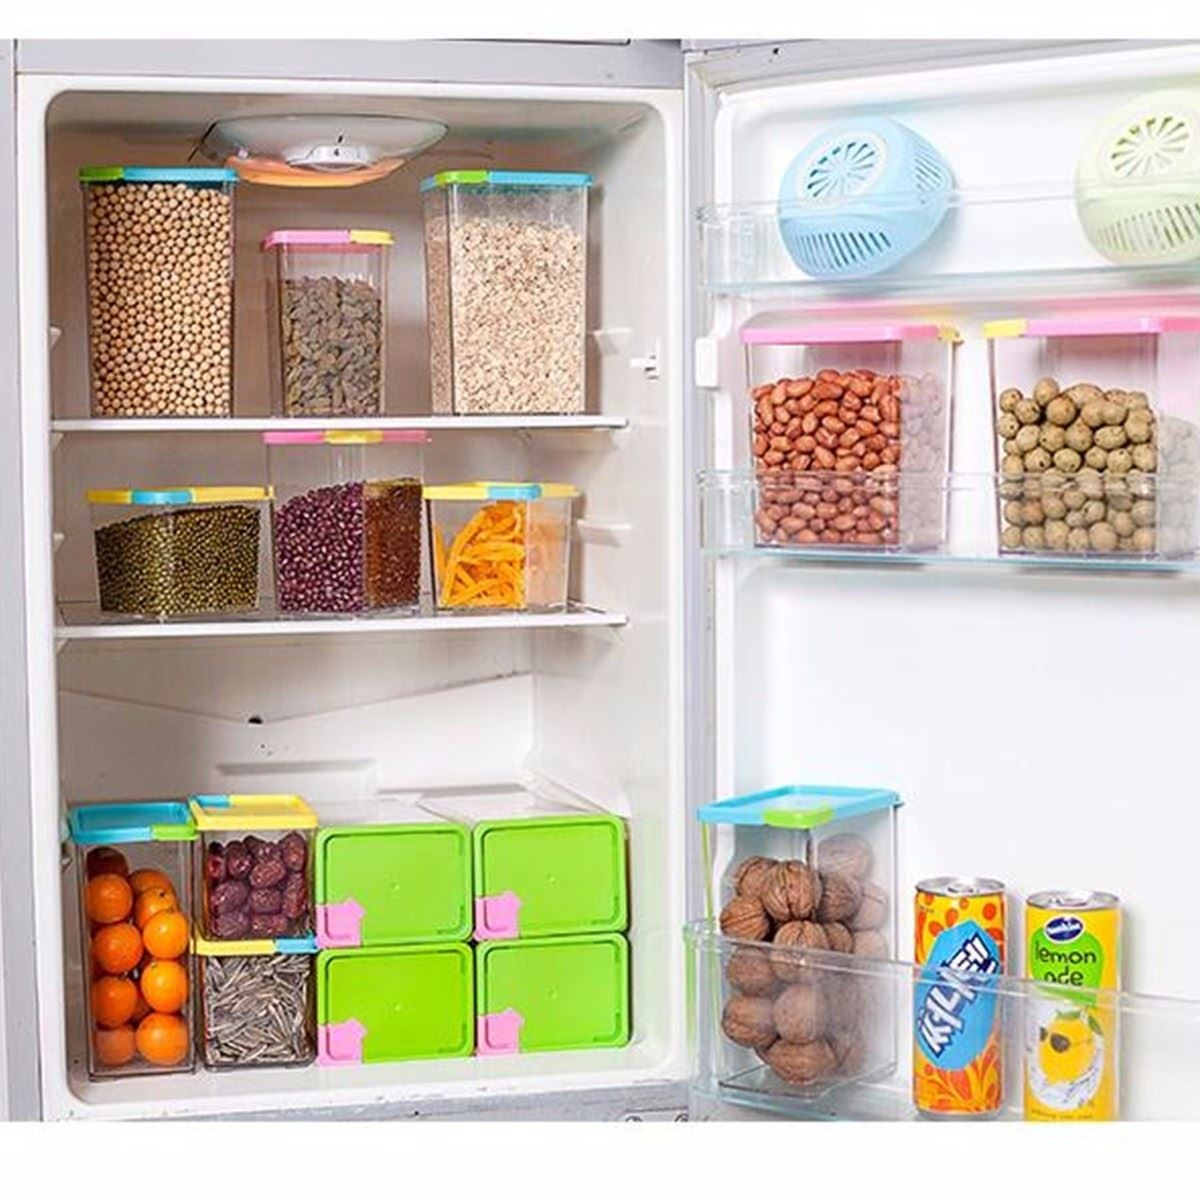 Best Kitchen Gallery: 530 800 1070ml Kitchen Food Storage Box Cereal Grain Bean Holder of Grain Storage Containers Home  on rachelxblog.com